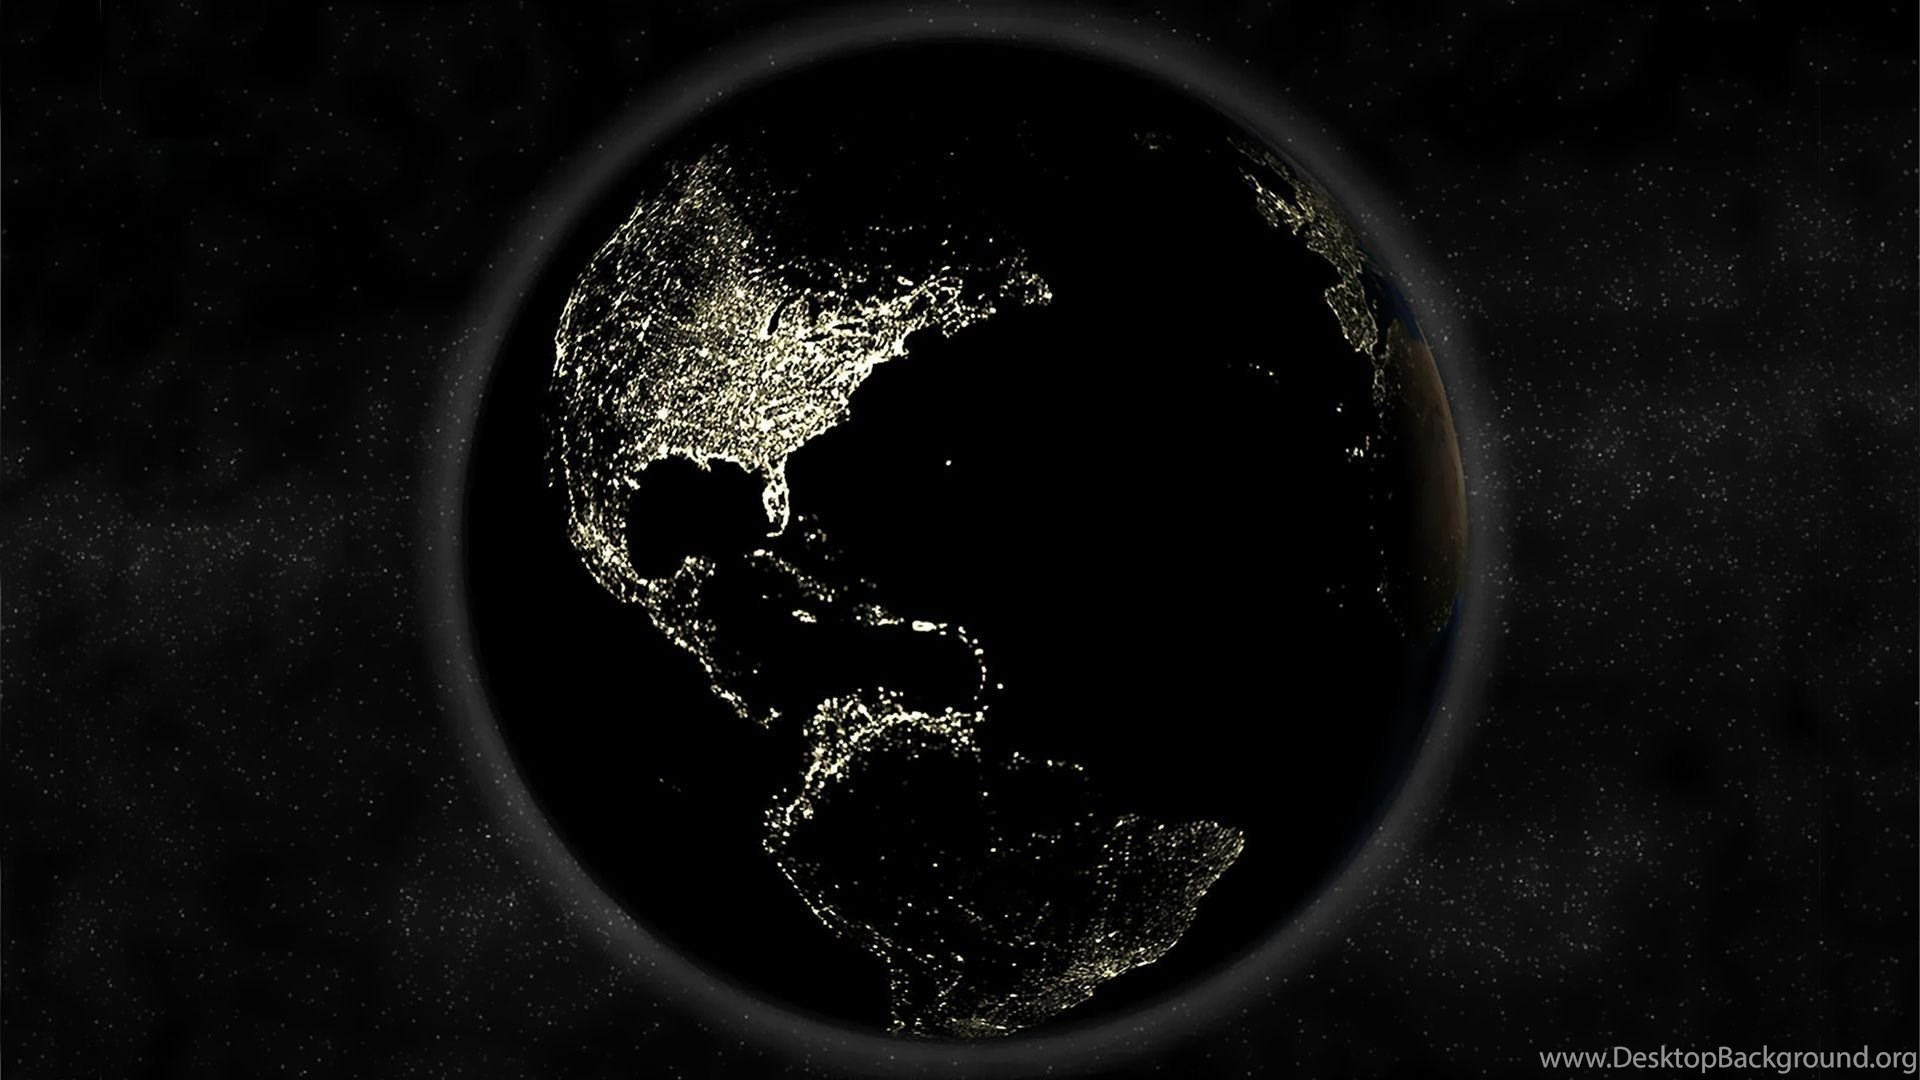 Black Earth On Space Wallpaper Download Jpg Desktop Background